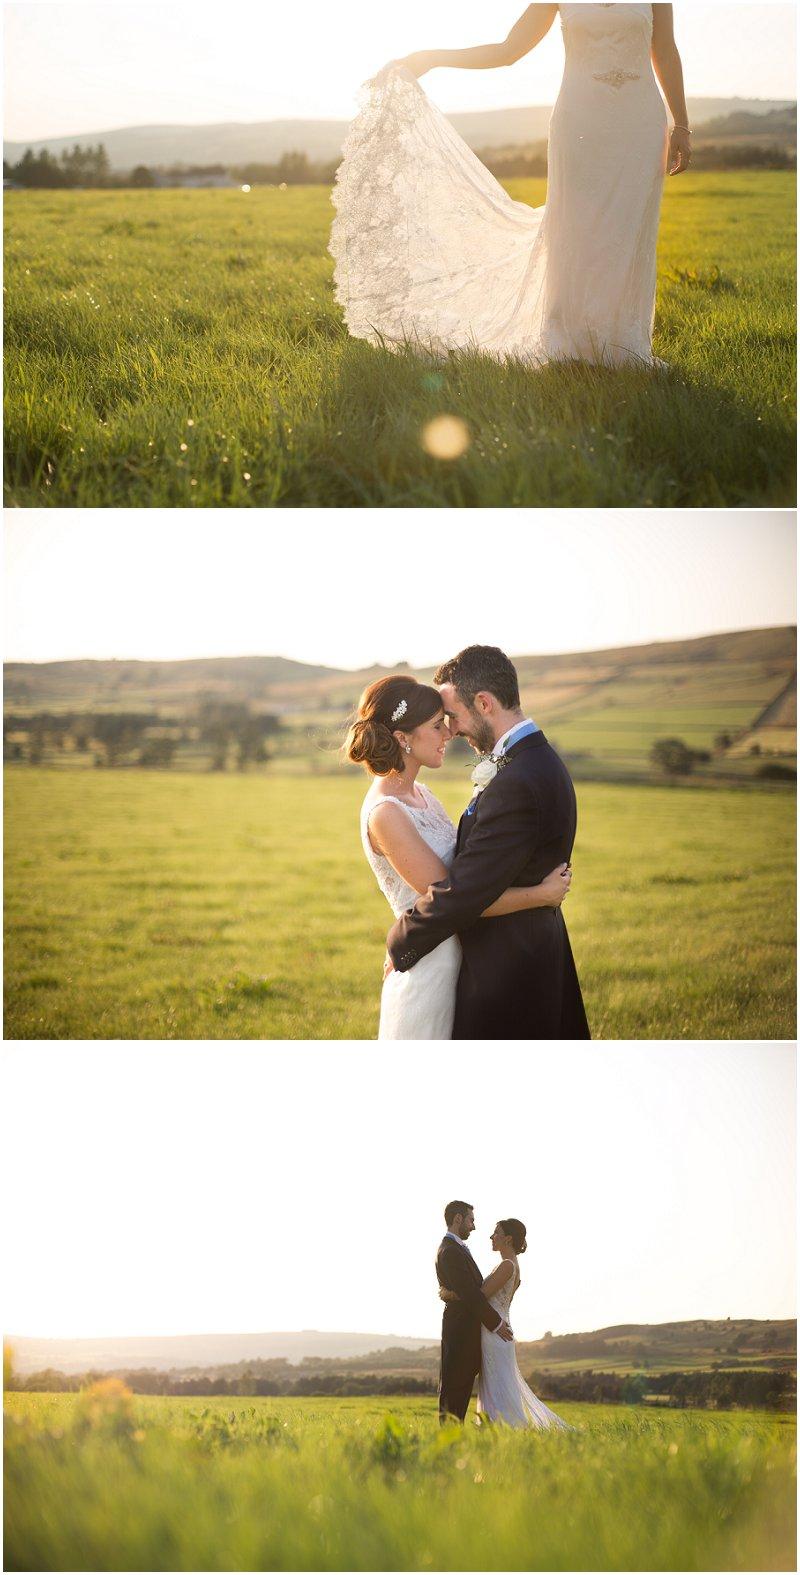 Karli Harrison Photography | Golden Hour at The Alma Inn Lancashire Photographer